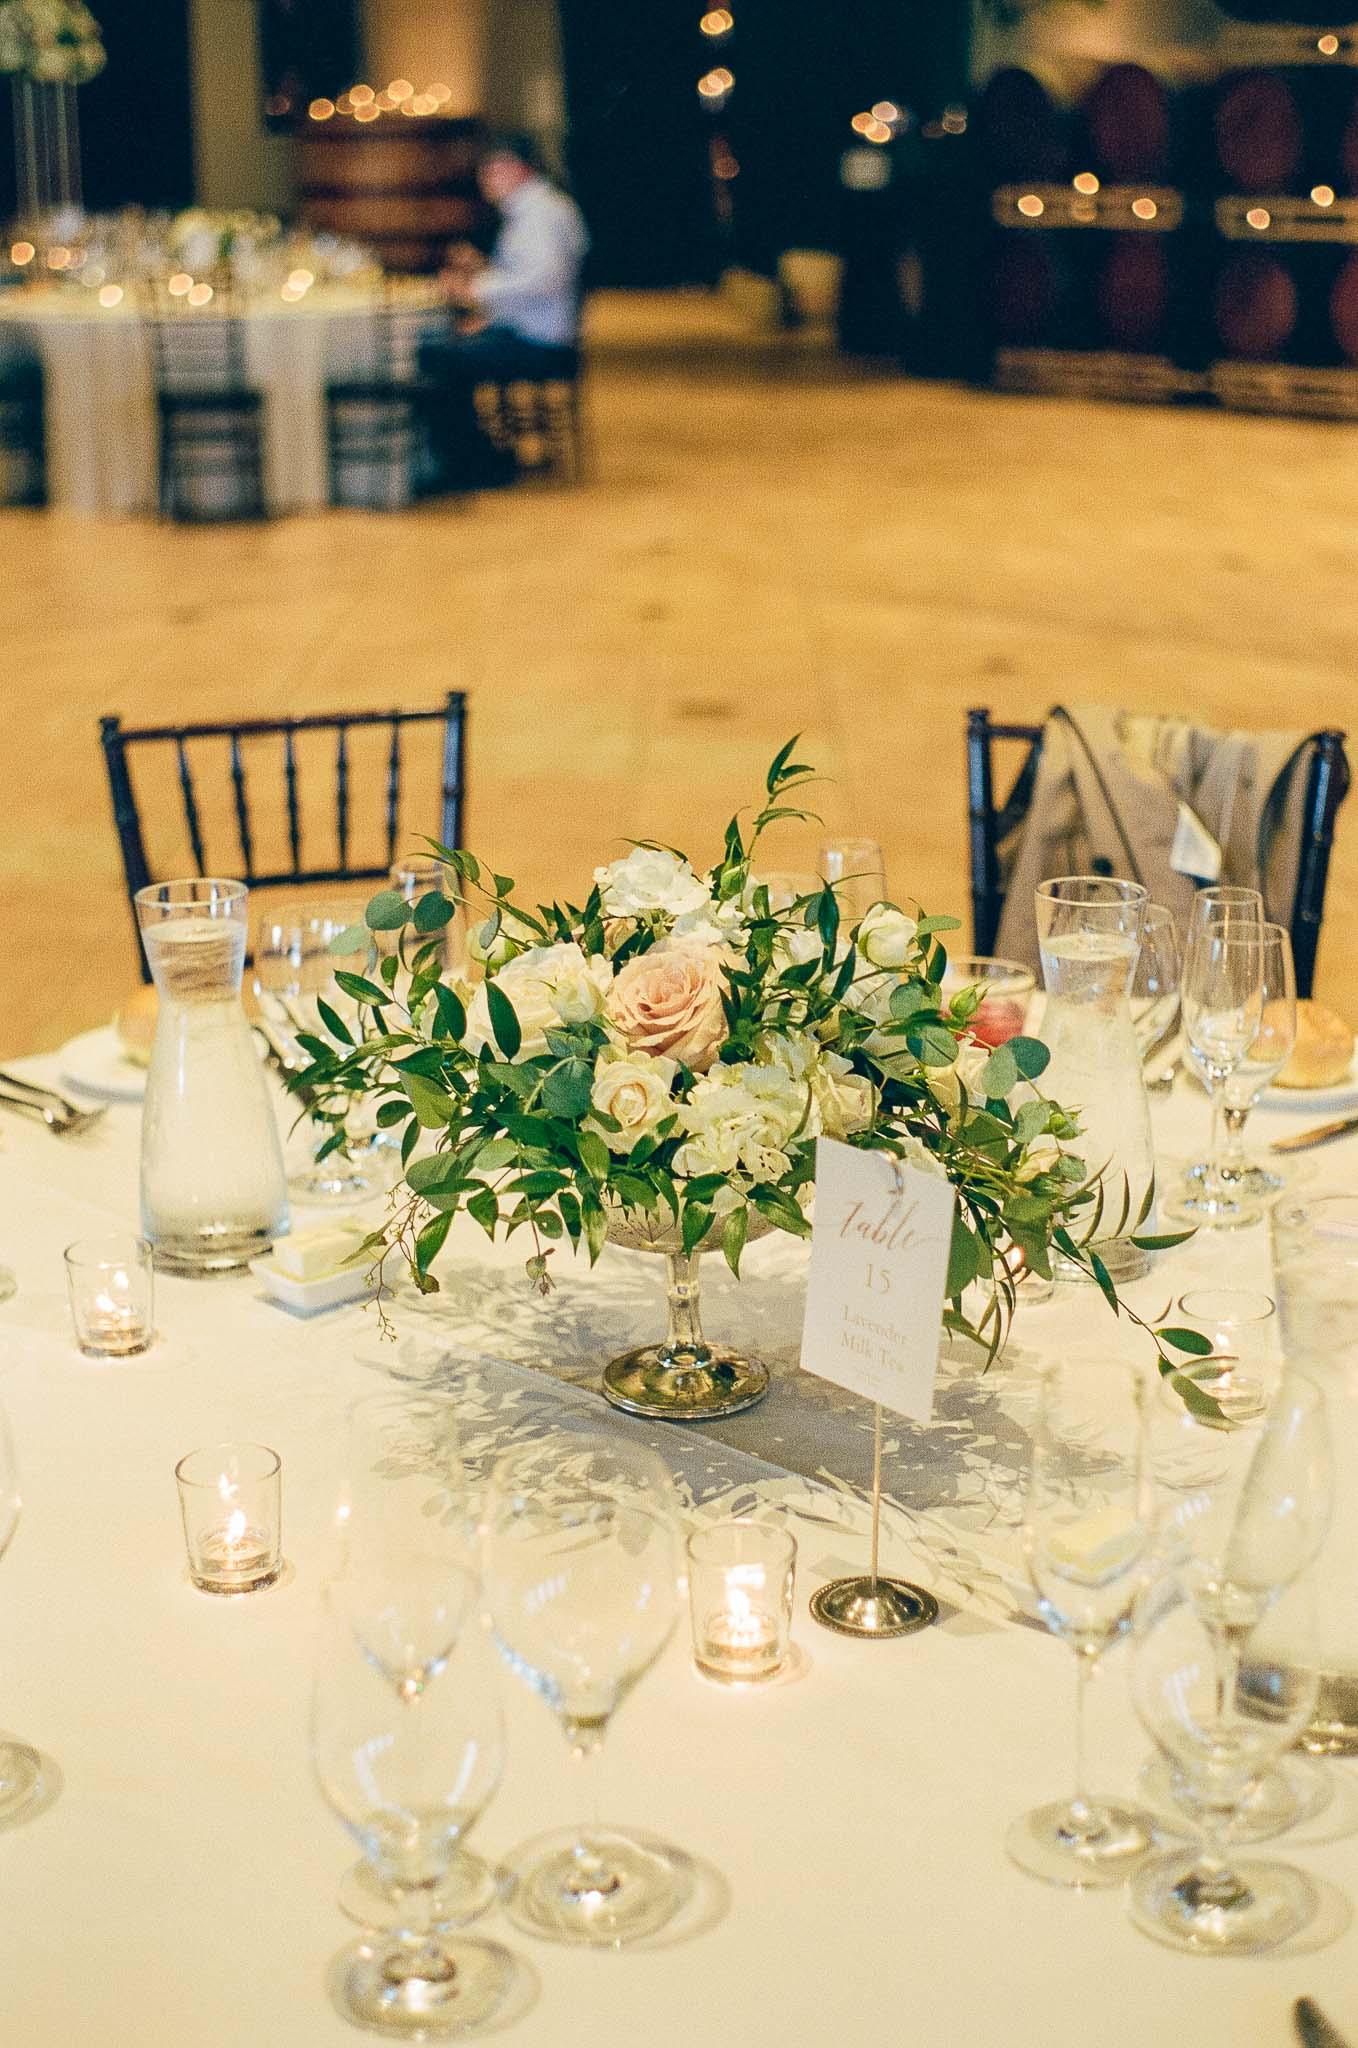 Wedding-Flower-Table-Decoration.jpg